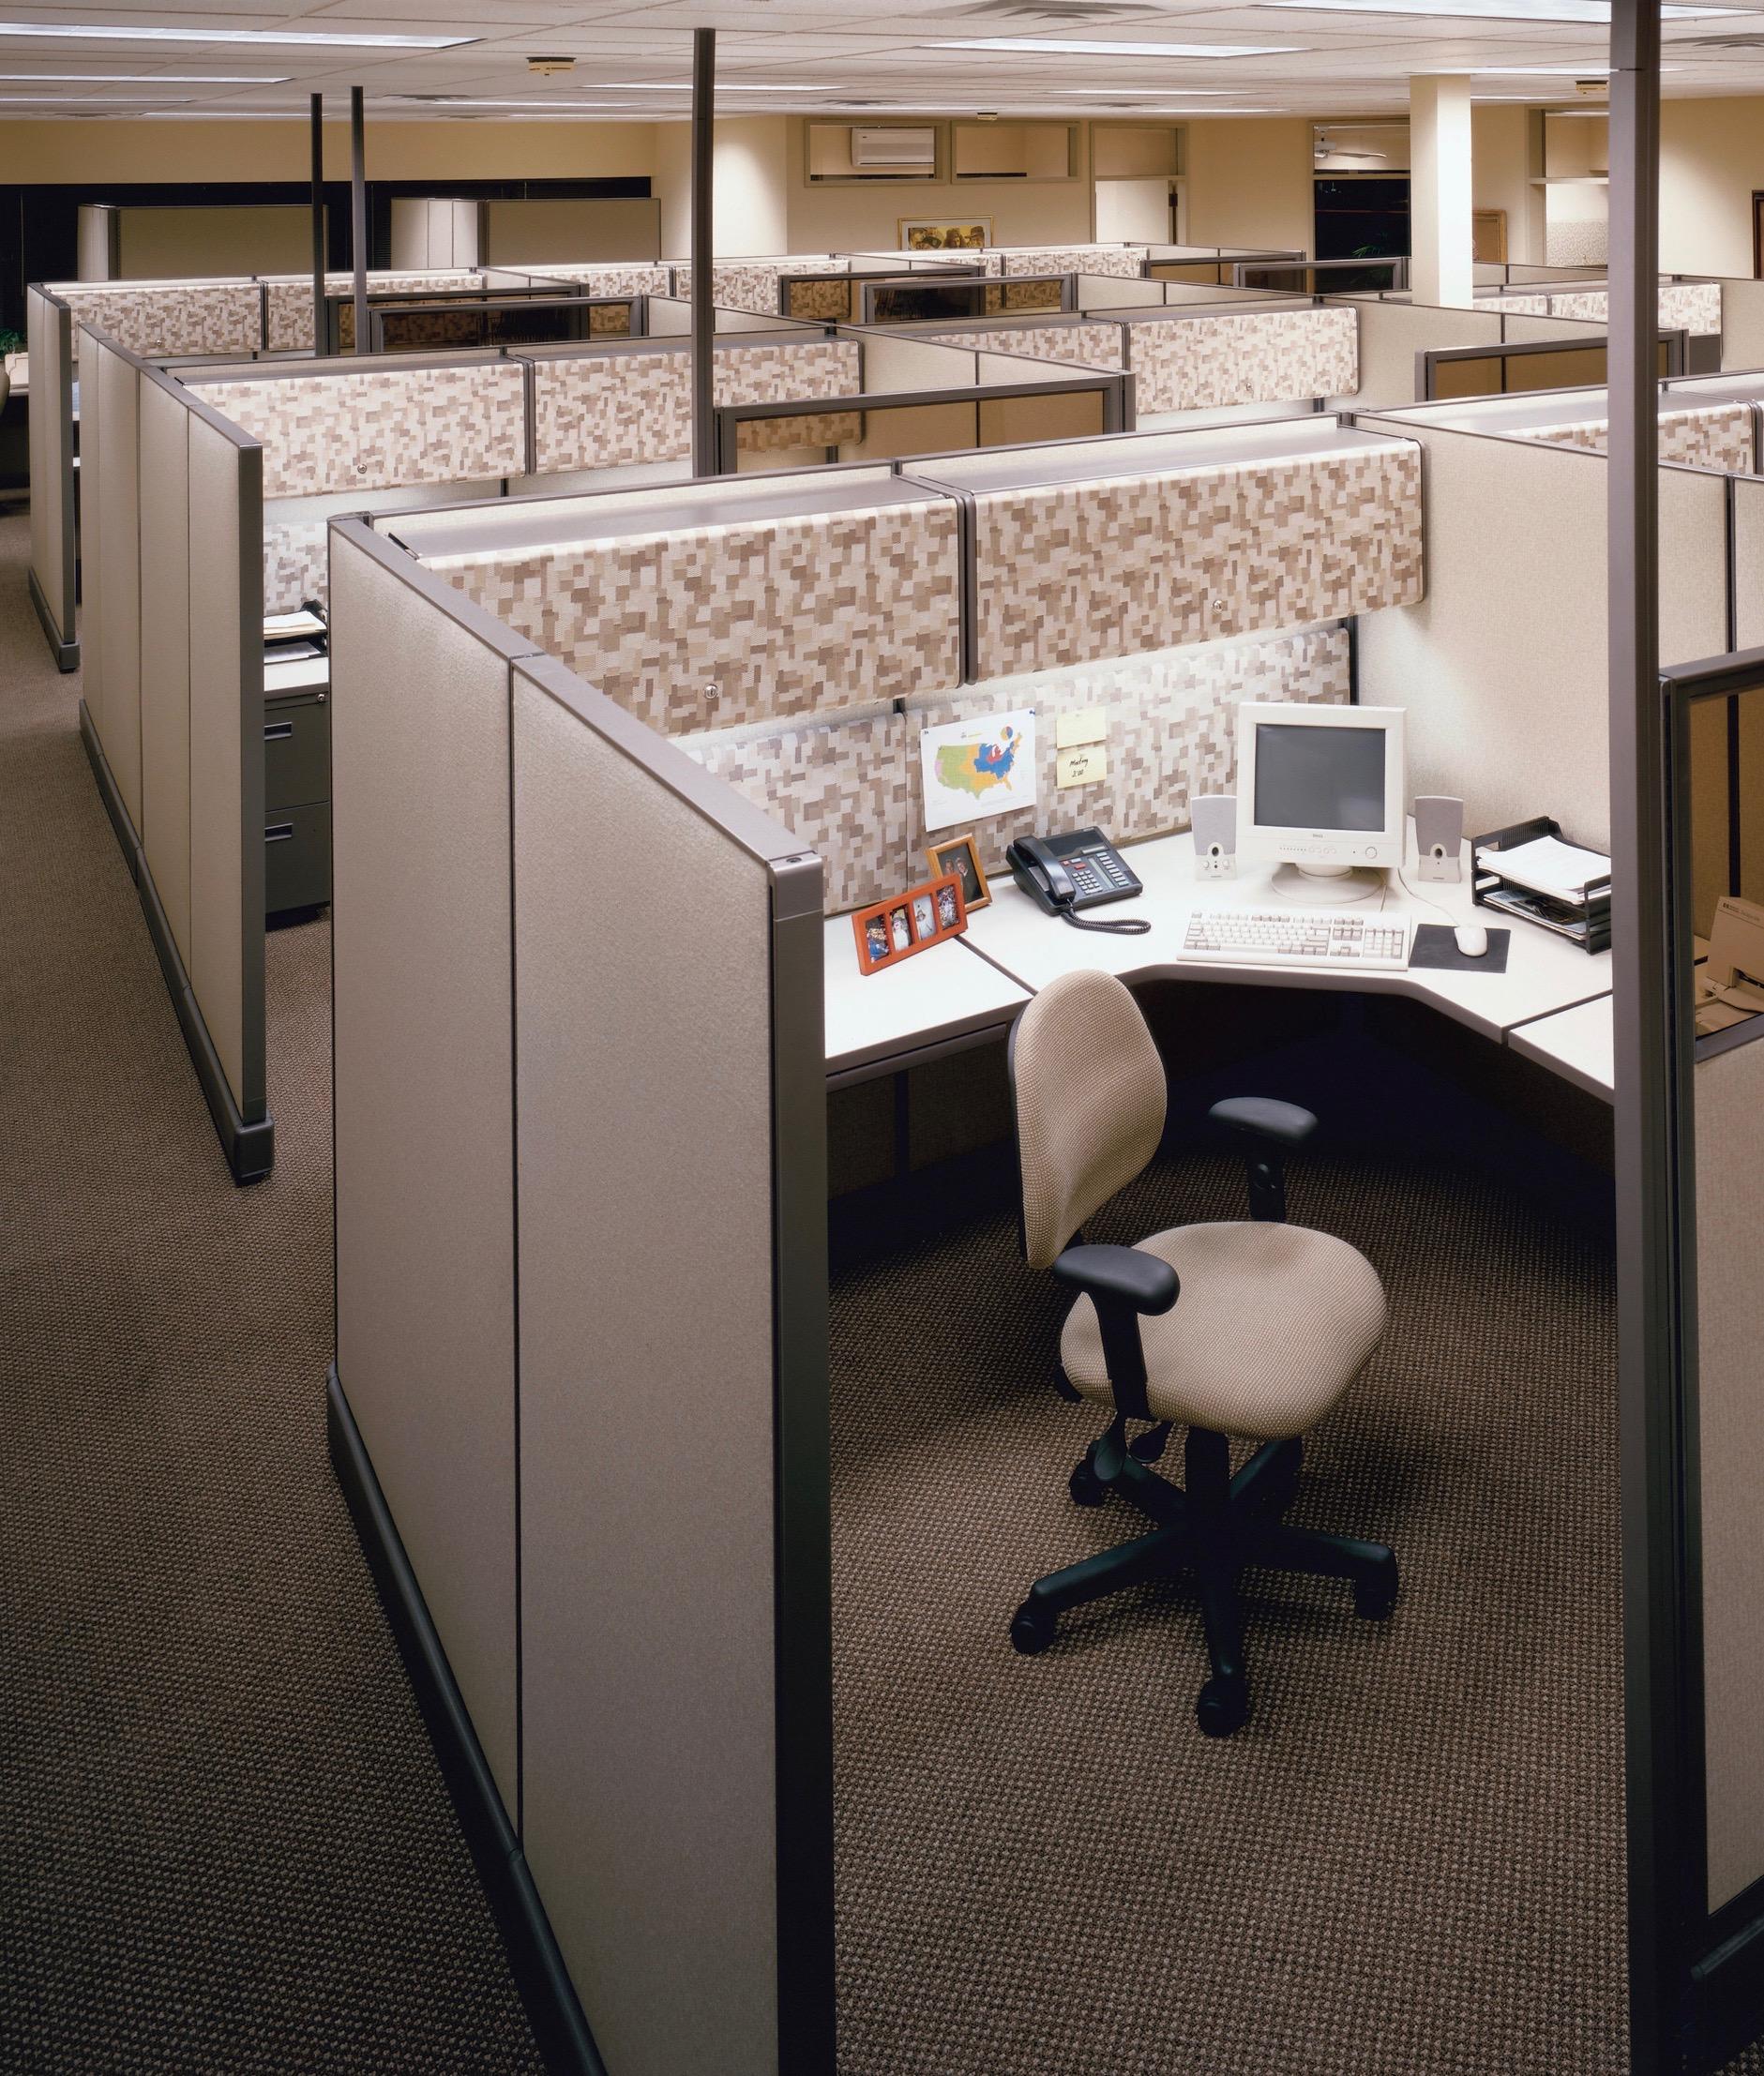 cubicle r mike vennart - HD2800×2214